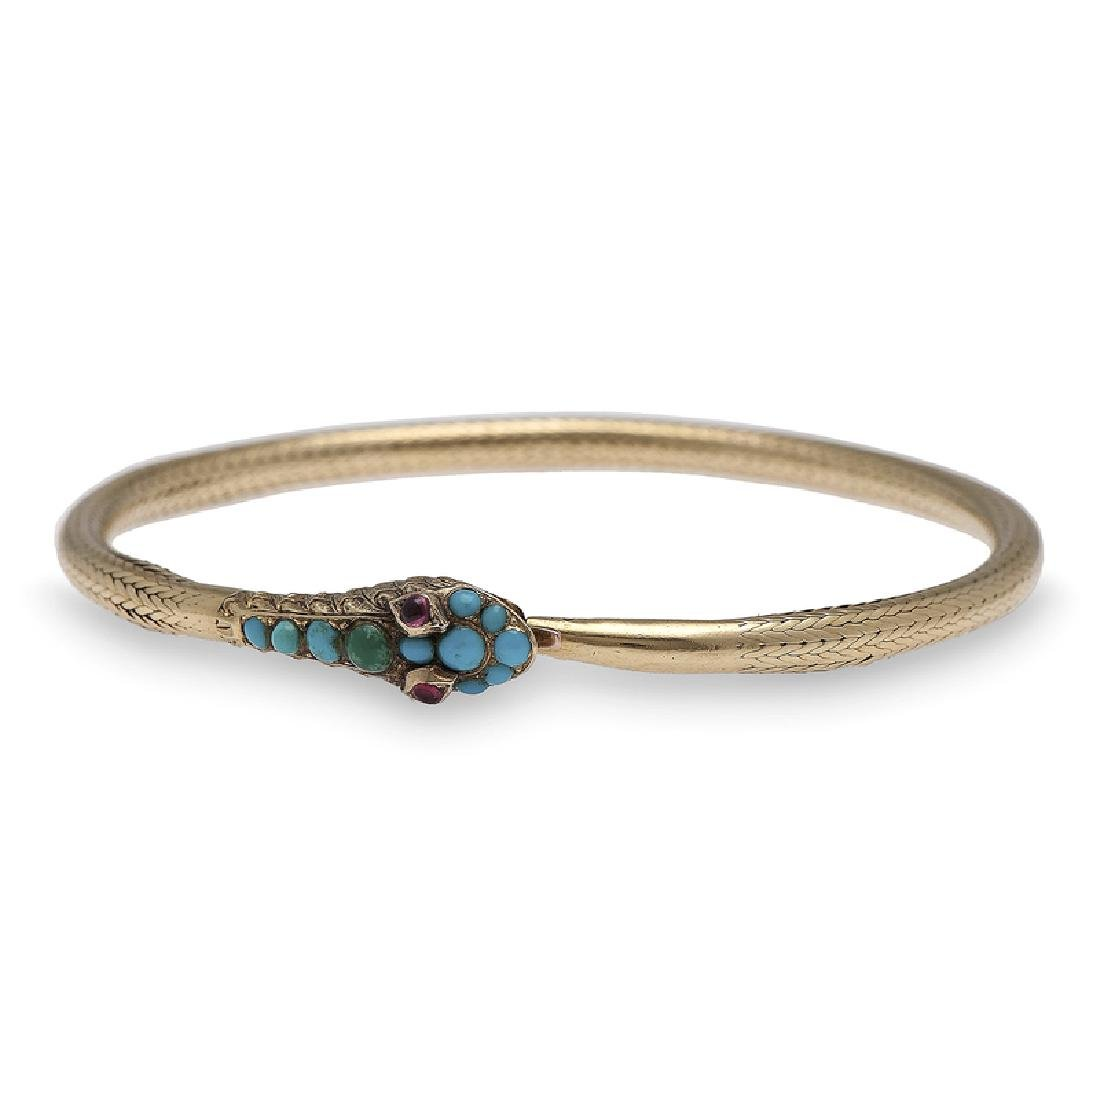 18 Karat Yellow Gold Victorian Serpent Snake Bracelet